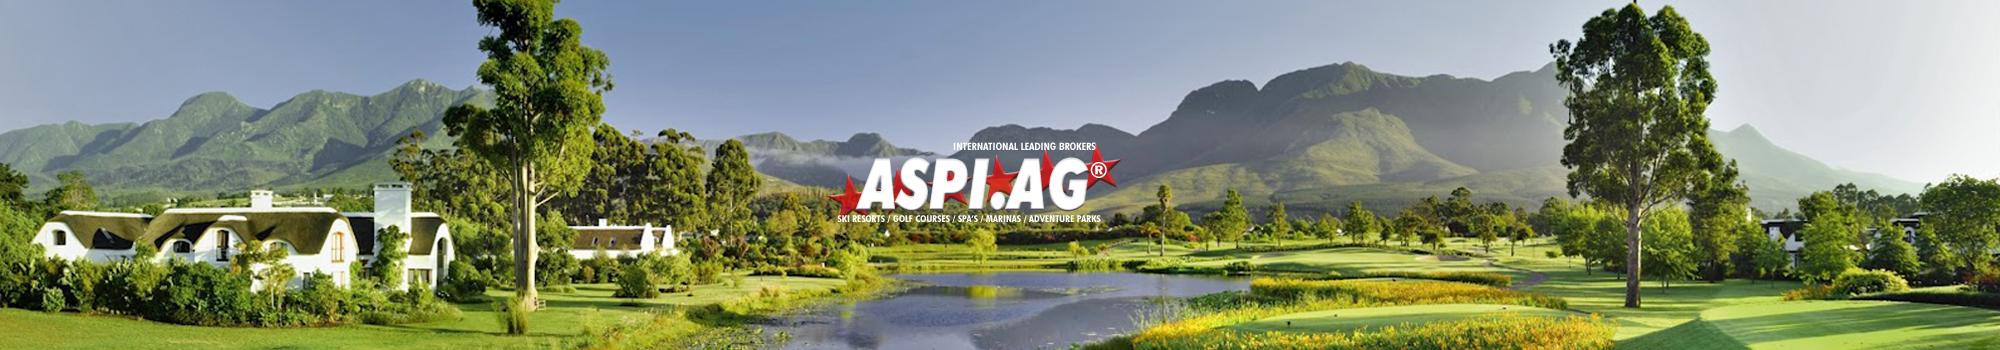 ASP Expert Broker golf courses, marinas, adventure parks, sports parks, spa's